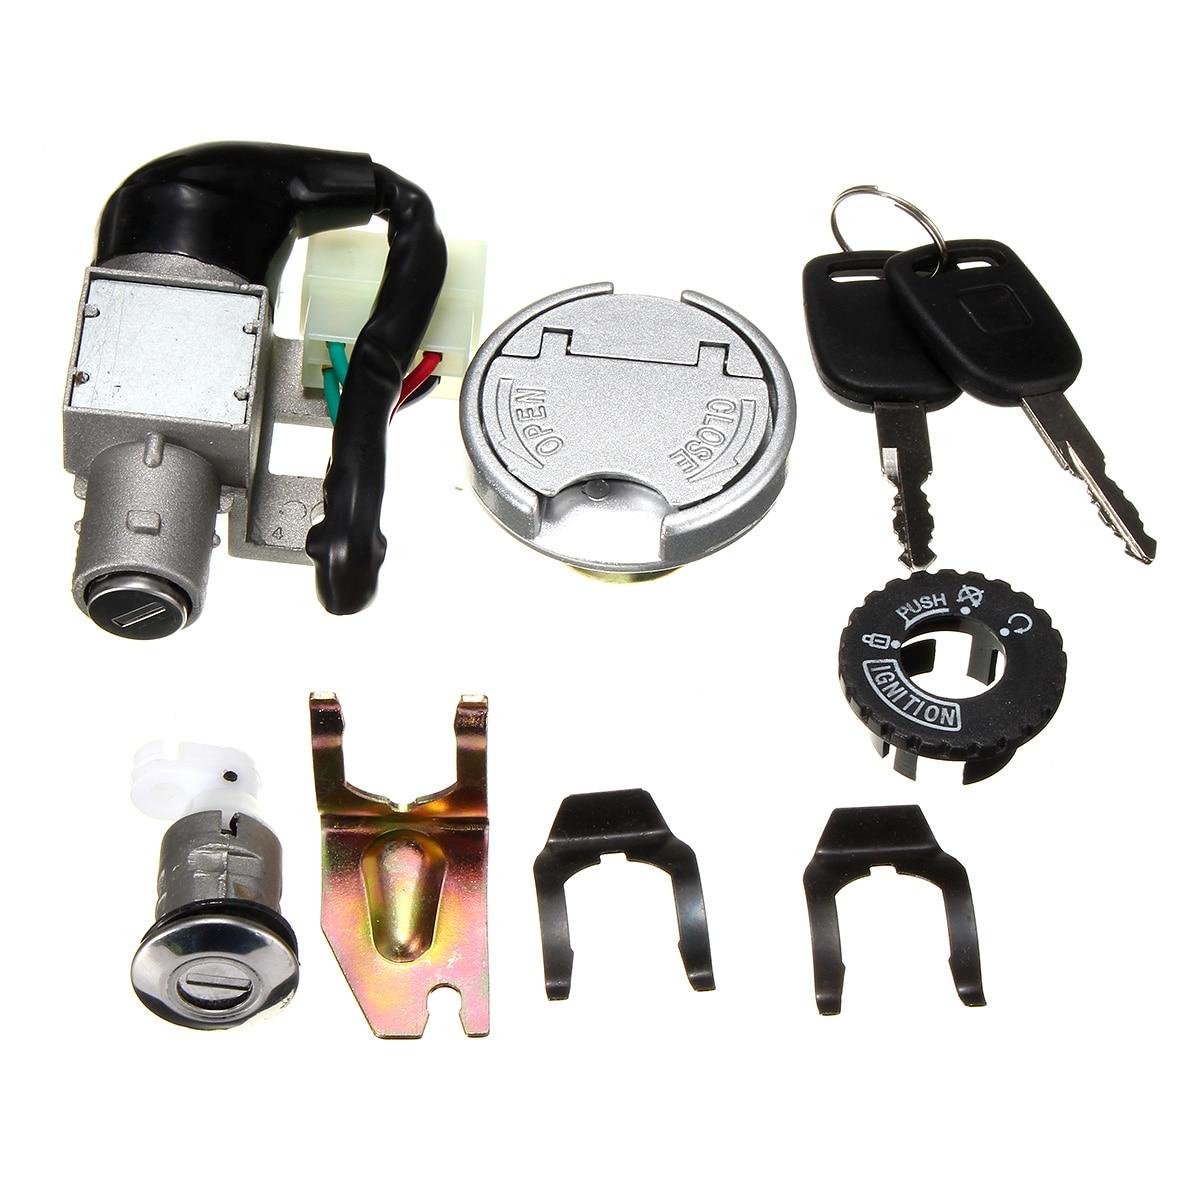 Universal Motorcycle Ignition Lock Switch Fuel Tank Cap 2 Keys For GY6 50CC Baotian Benzhou Buffalo Jmstar Jack Fox REX